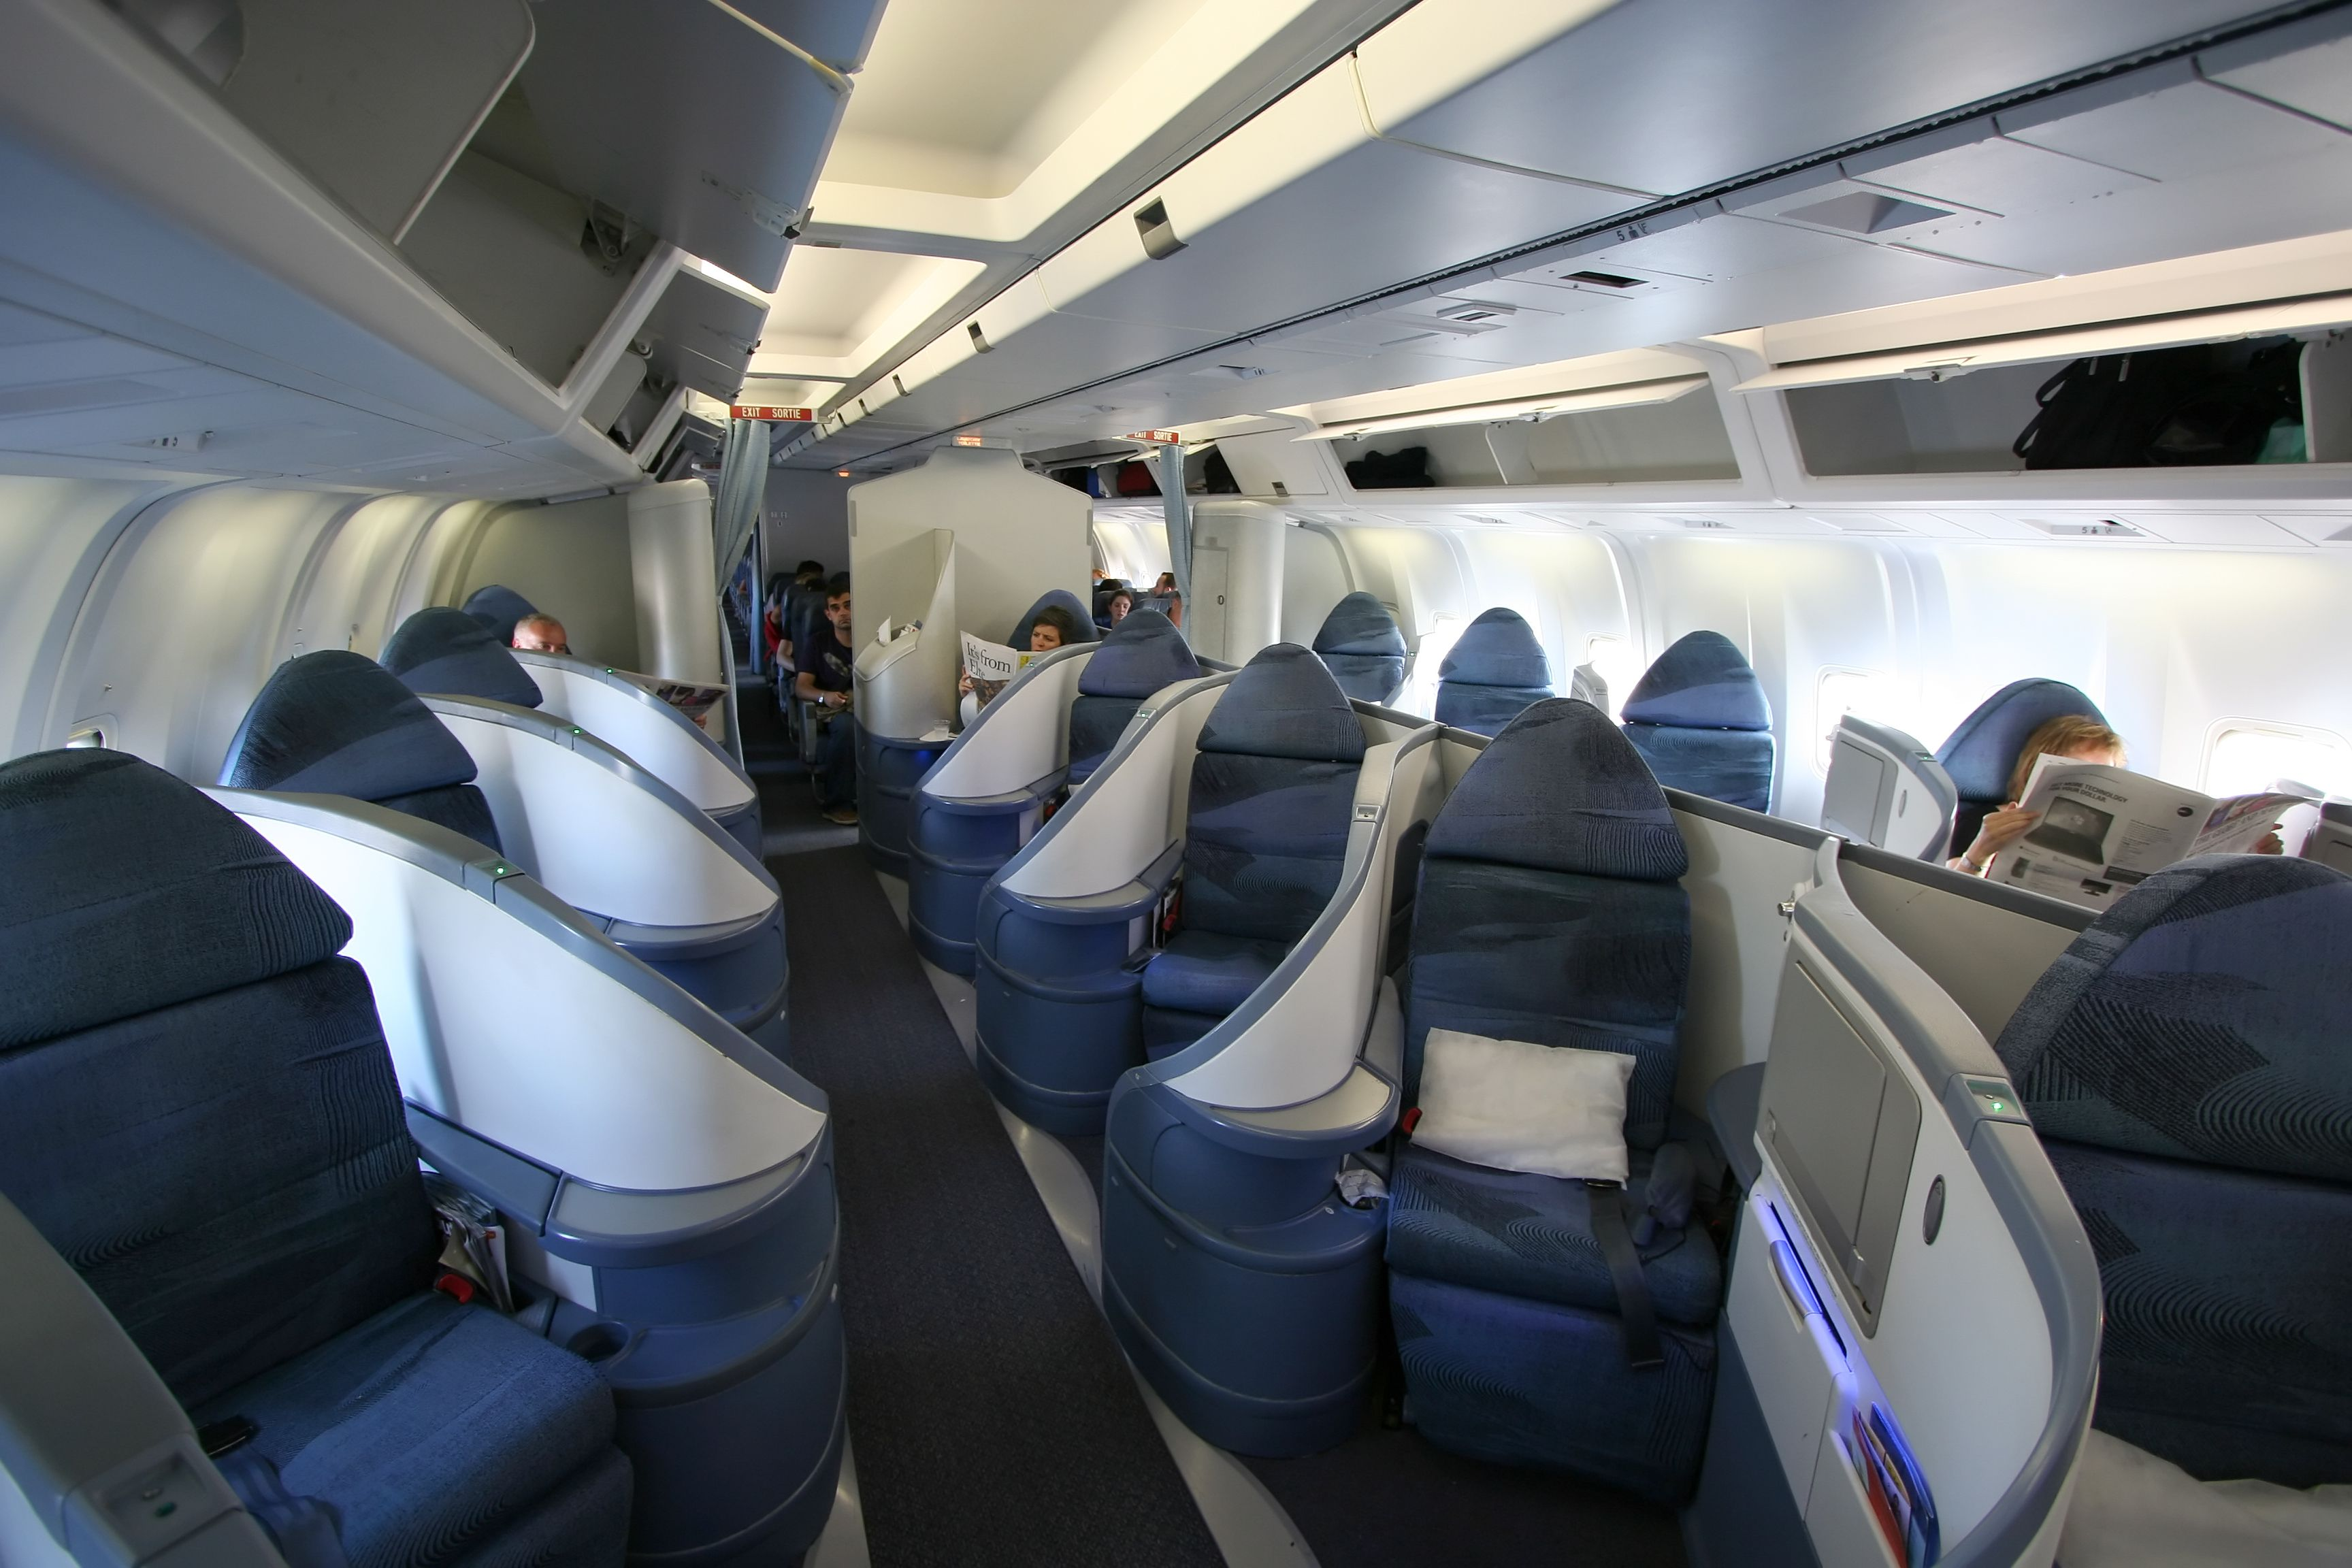 Aircanada Á®æ¤œç´¢çµæžœ Yahoo Ƥœç´¢ ǔ»åƒ Best Airlines Air New Zealand Malaysia Airlines